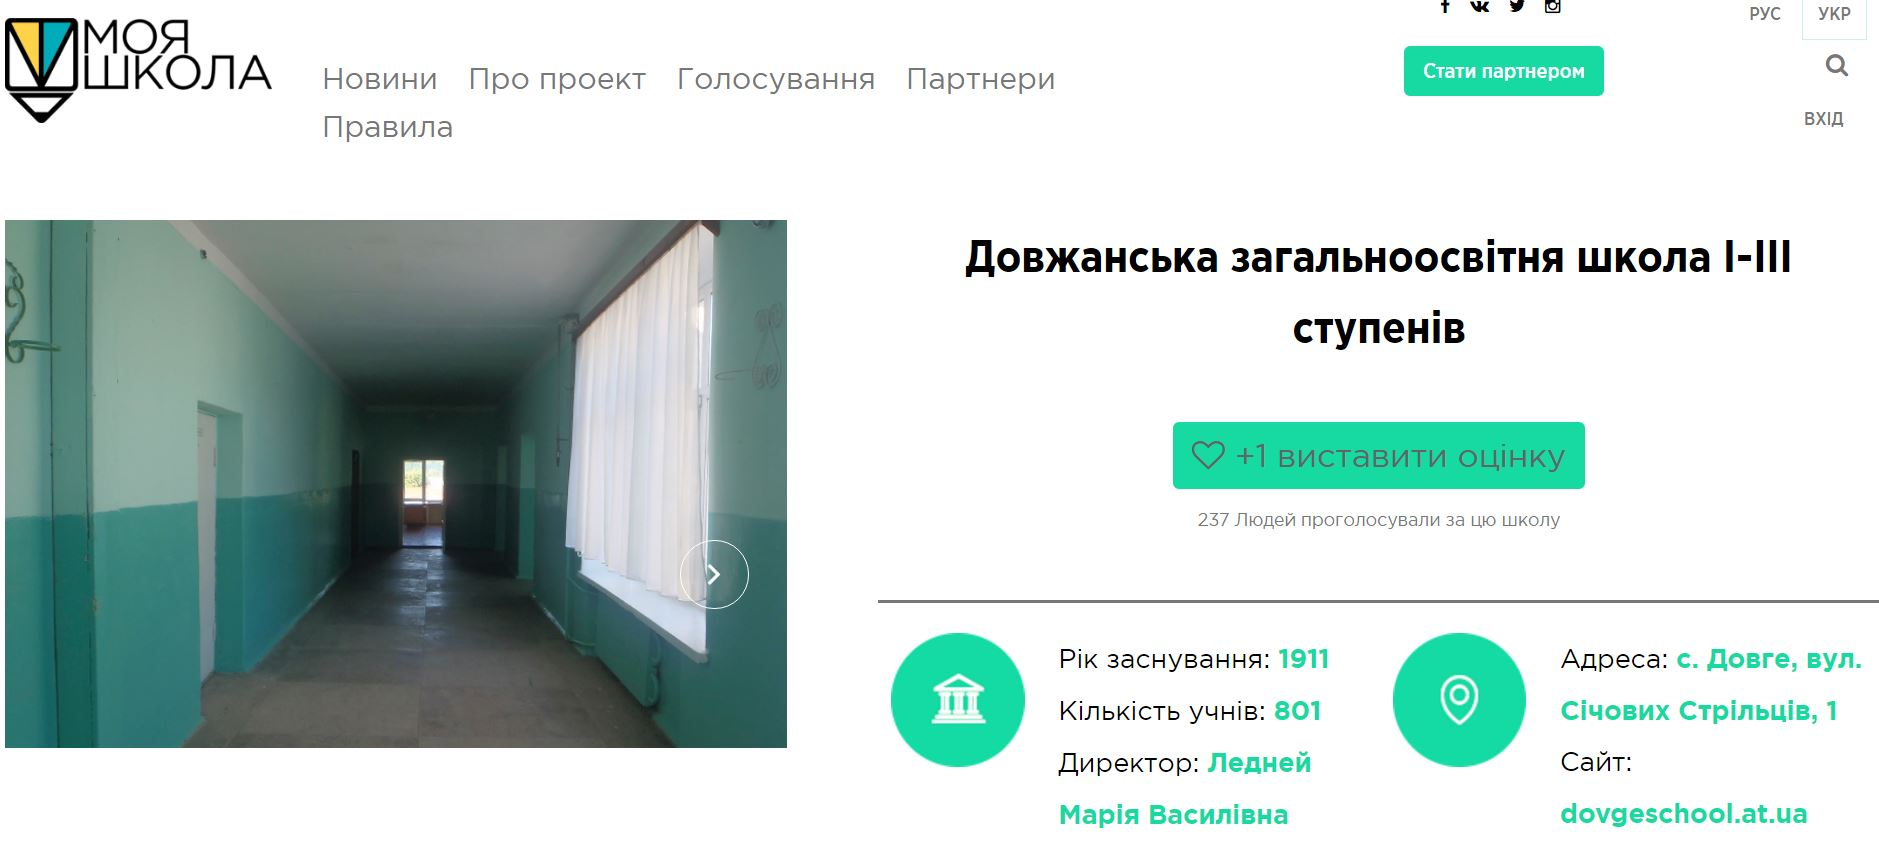 "Довжанська ЗОШ бере участь у всеукраїнській акції ""Моя школа"""